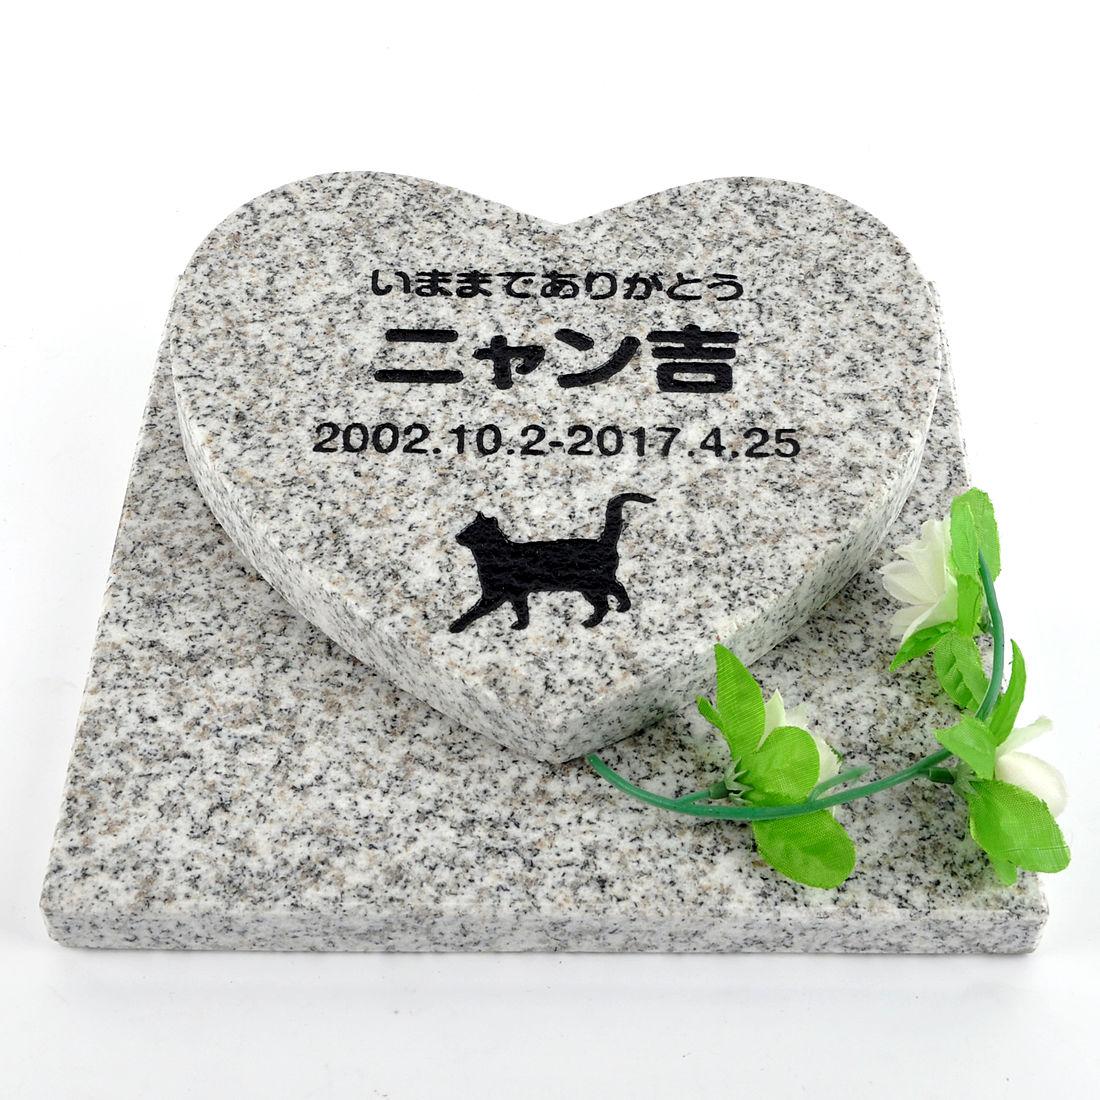 Pet&Love. ペットのお墓 天然石製 セット型 御影石 グレー ハート  【HLS_DU】【楽ギフ_名入れ】 attr131attr ctgr2ctgr sml3sml+ctgr2ctgr CAT